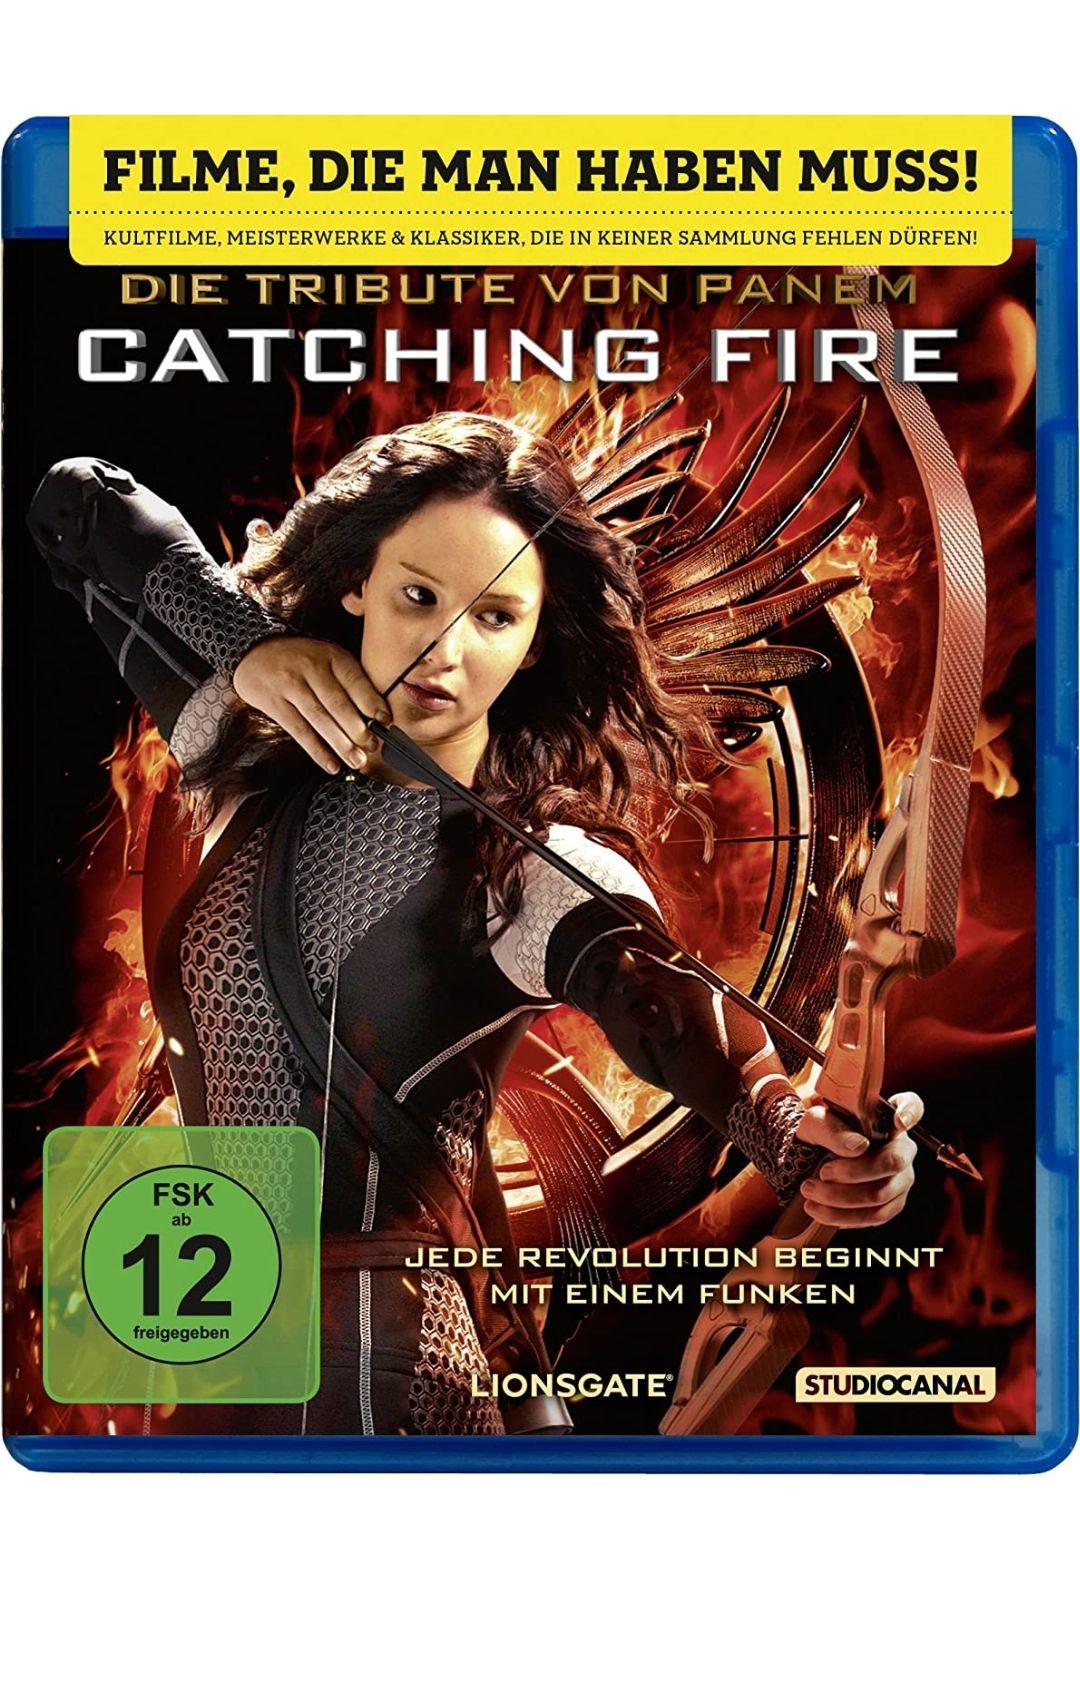 [Prime] Die Tribute von Panem - Catching Fire (Blu-ray)